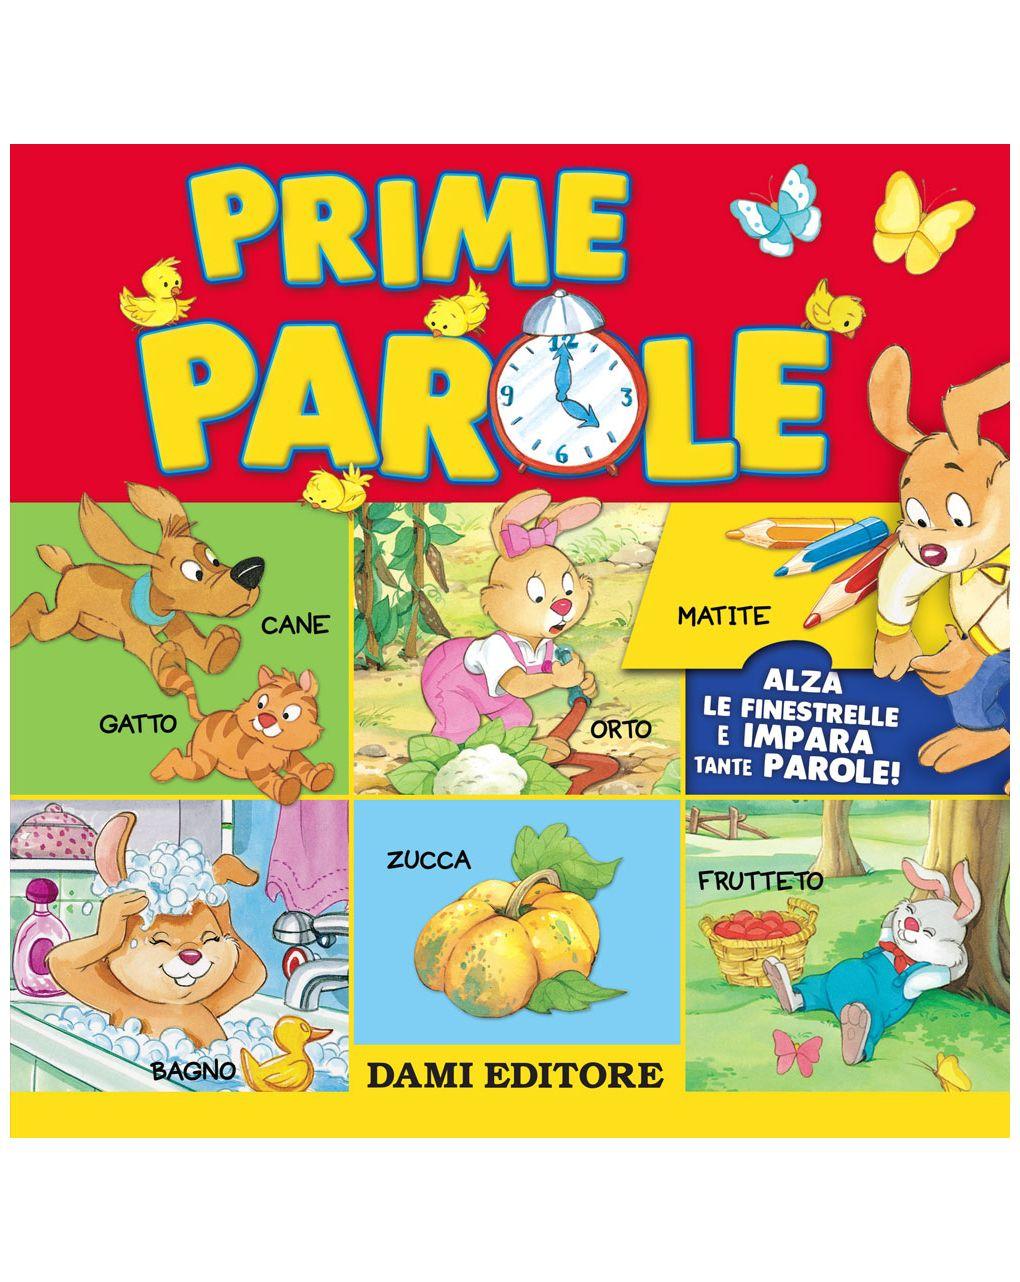 Prime parole - Dami